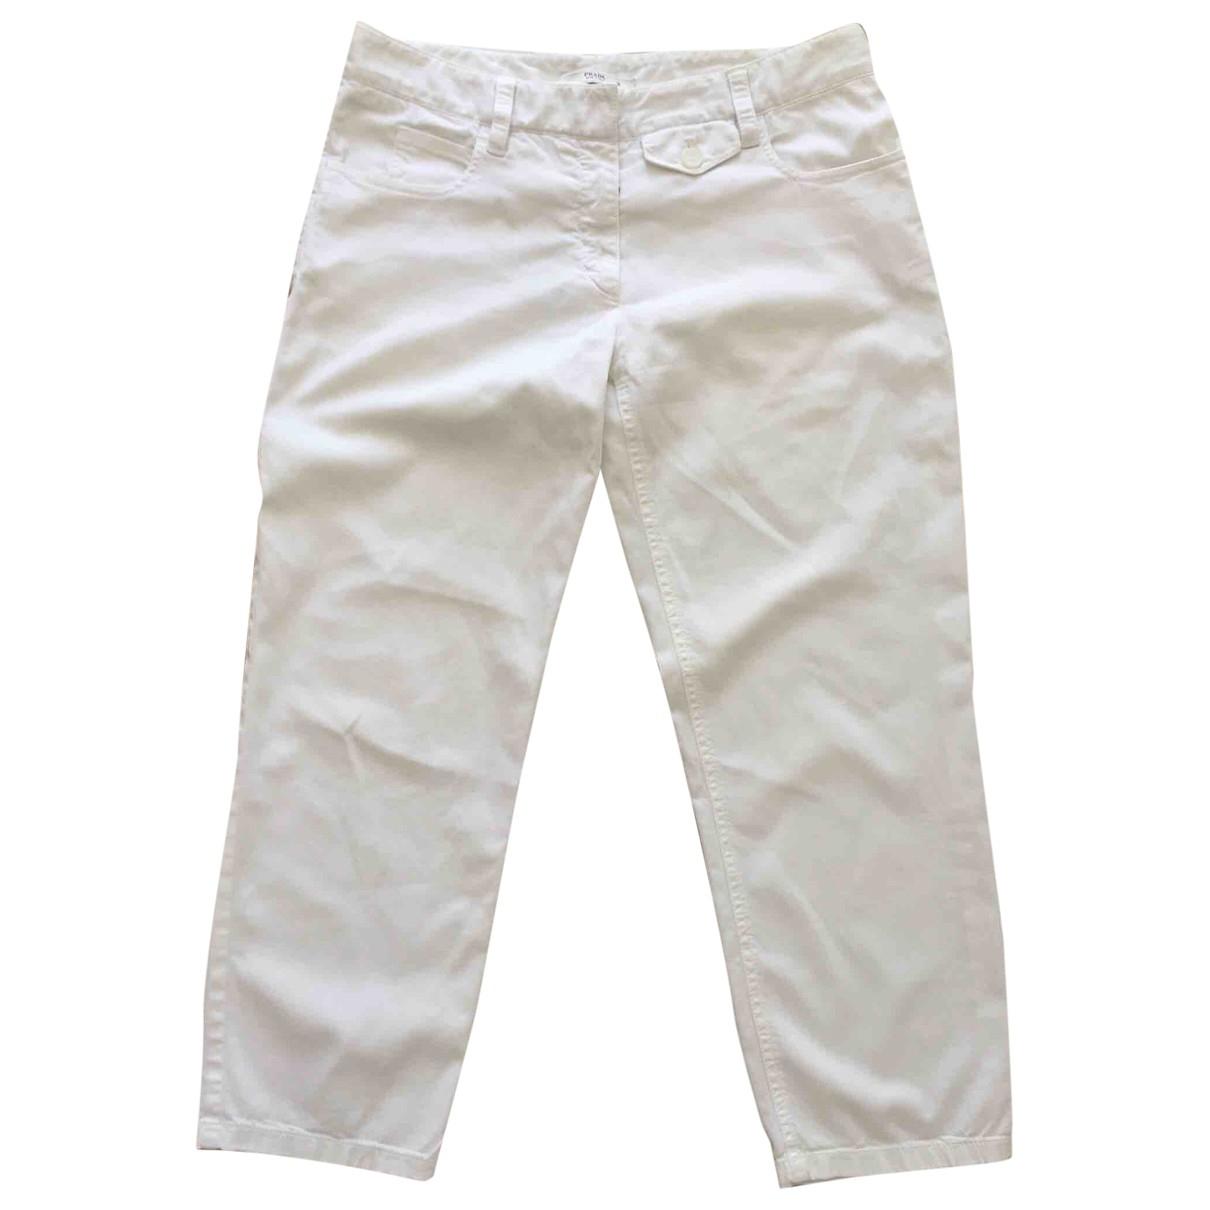 Prada \N White Cotton Trousers for Women XS International